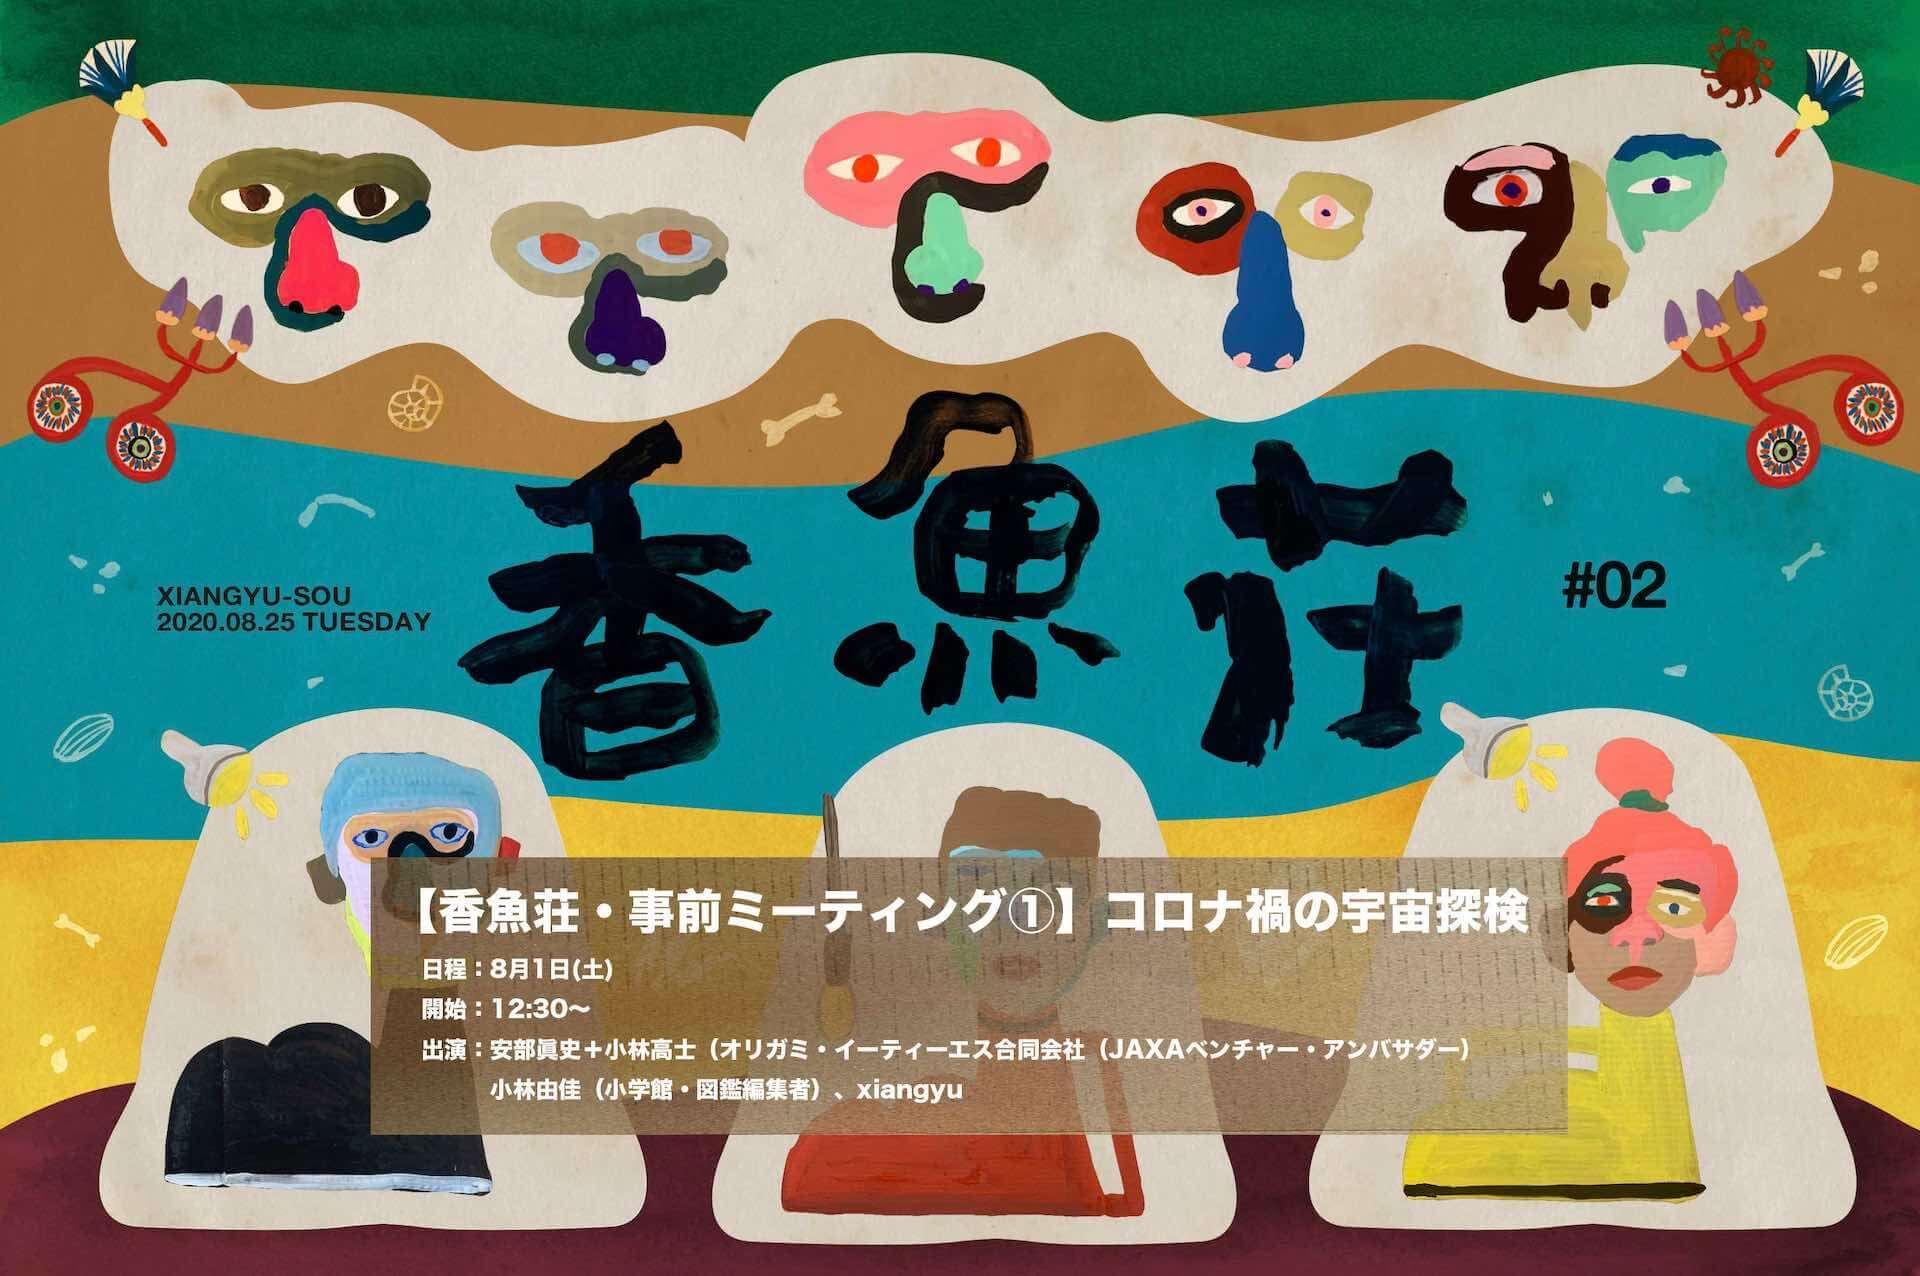 xiangyuが自主企画<香魚荘#02>の事前ミーティングをYouTubeにて明日開催!『コロナ禍の宇宙探検』の内容も明らかに music200731_xiangyu_3-1920x1276